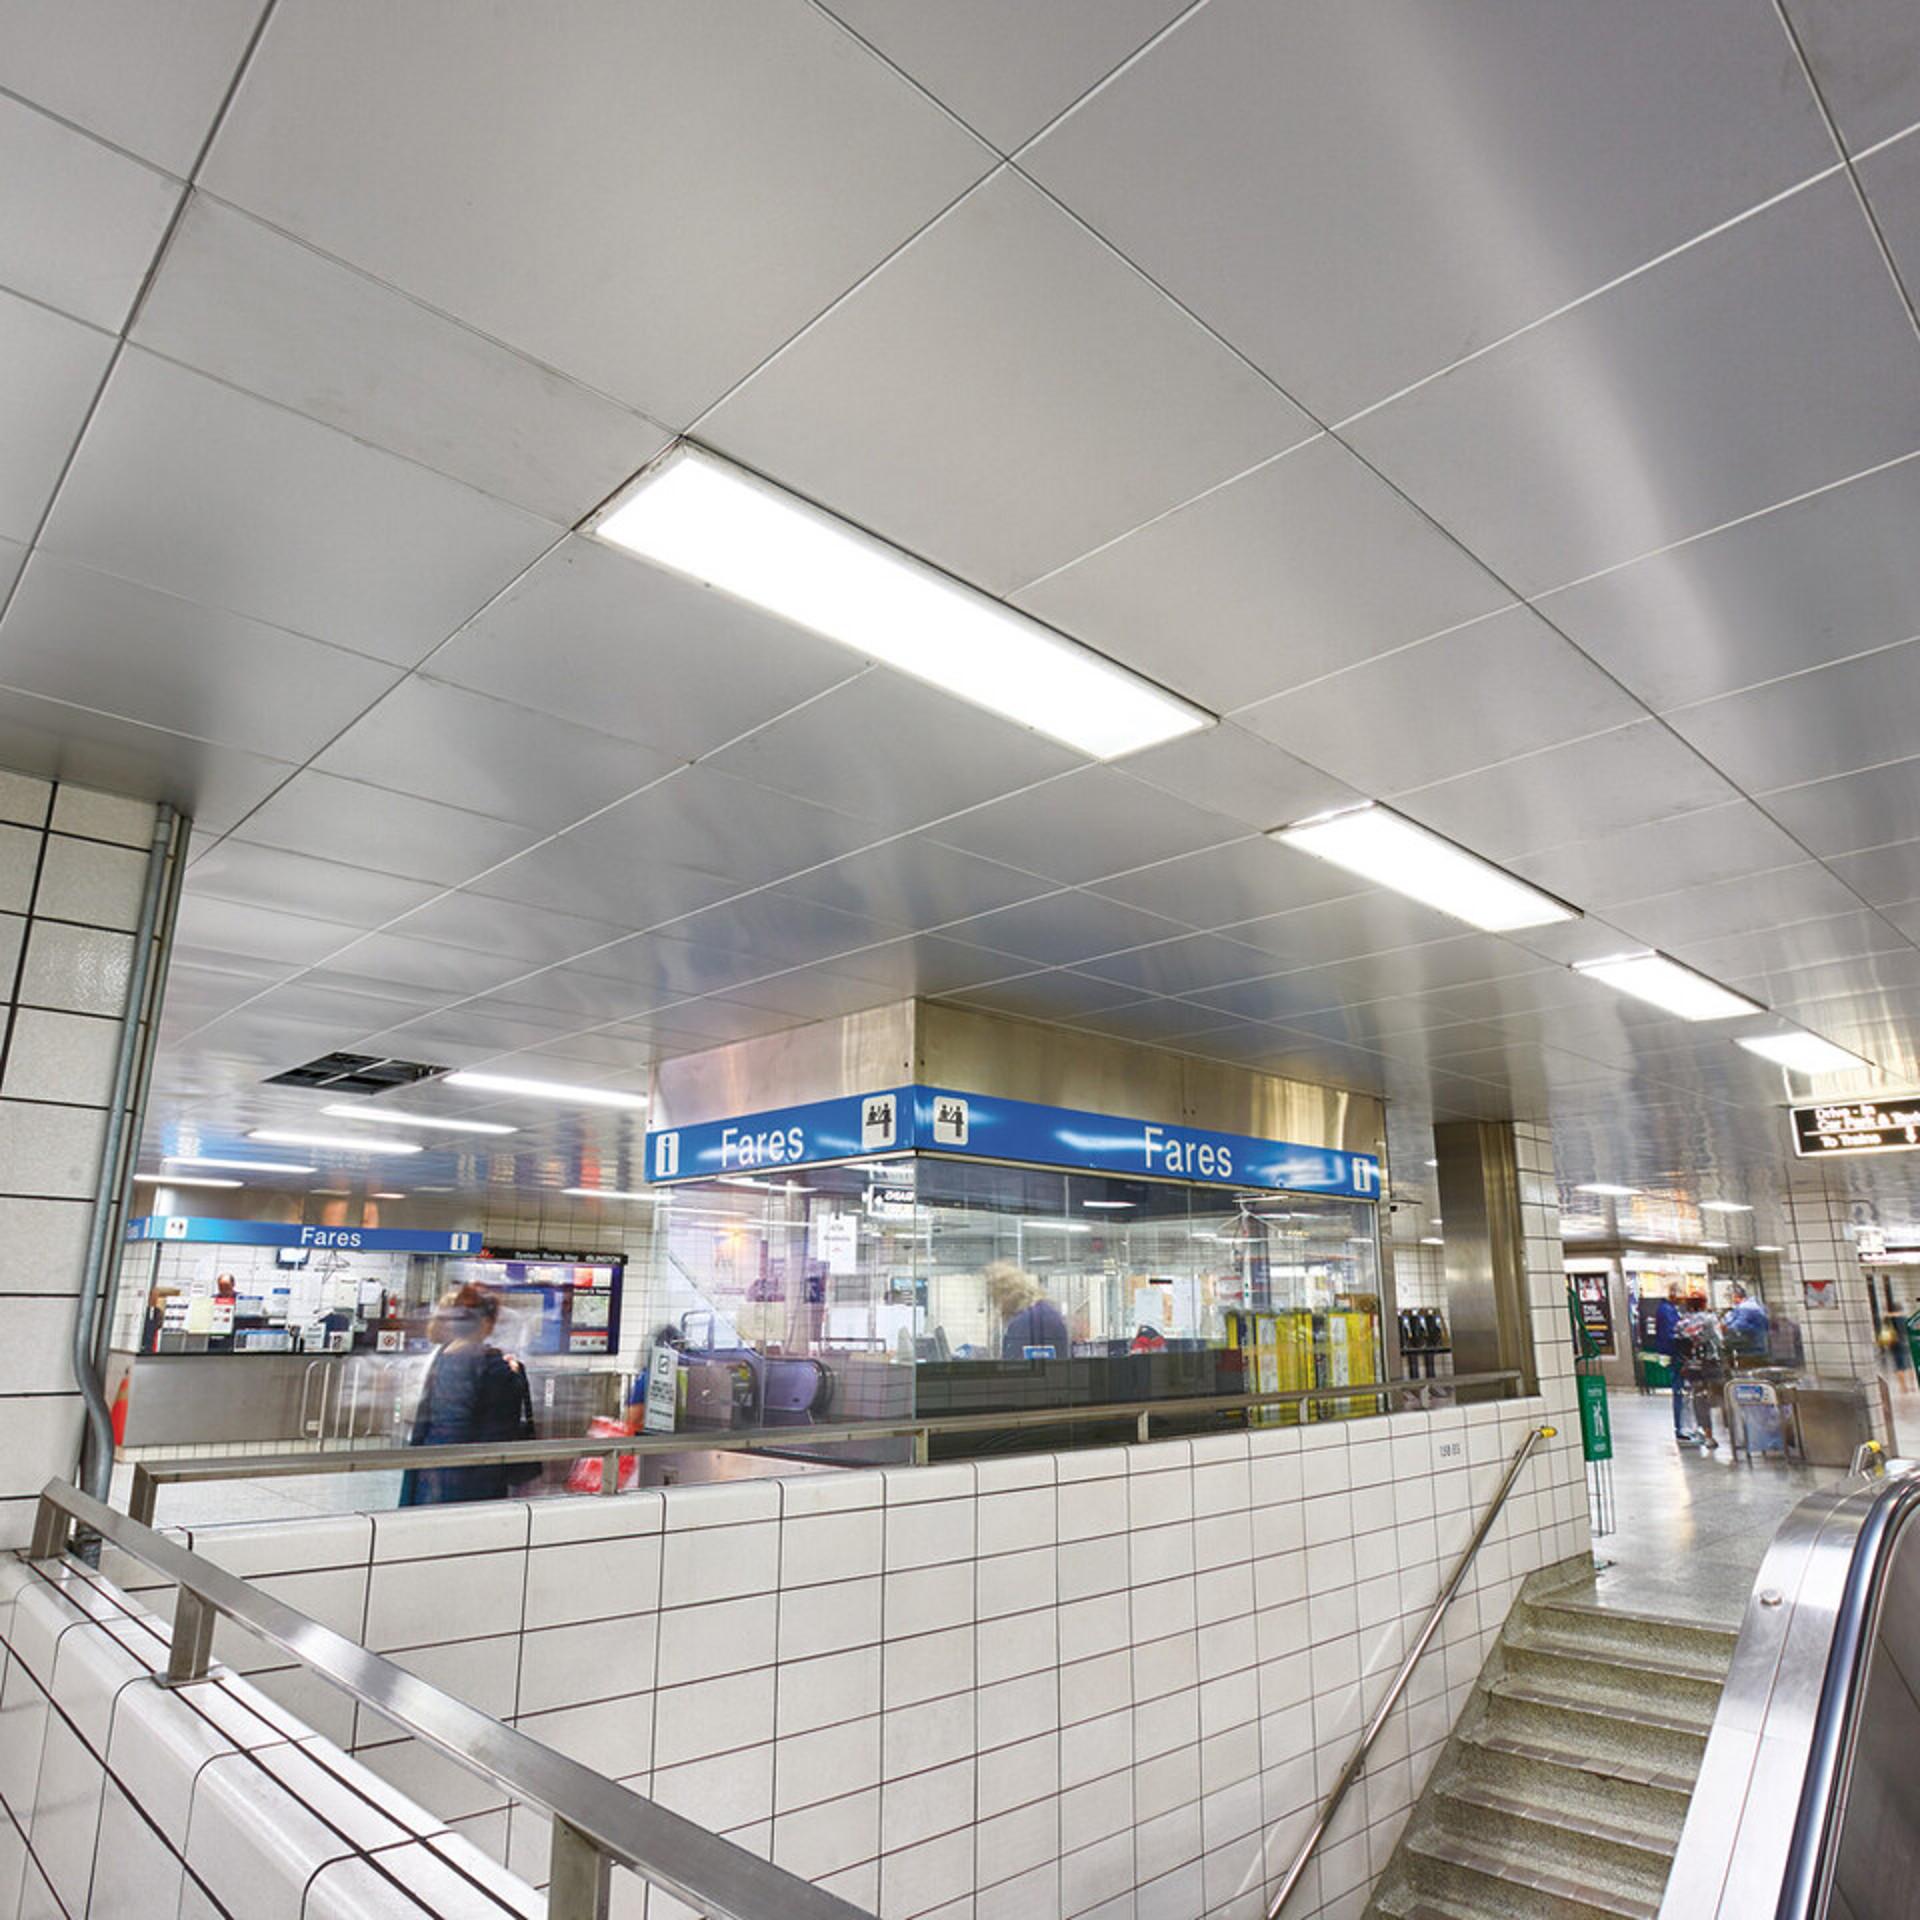 Rockfon Planostile D Metal Ceiling Panels